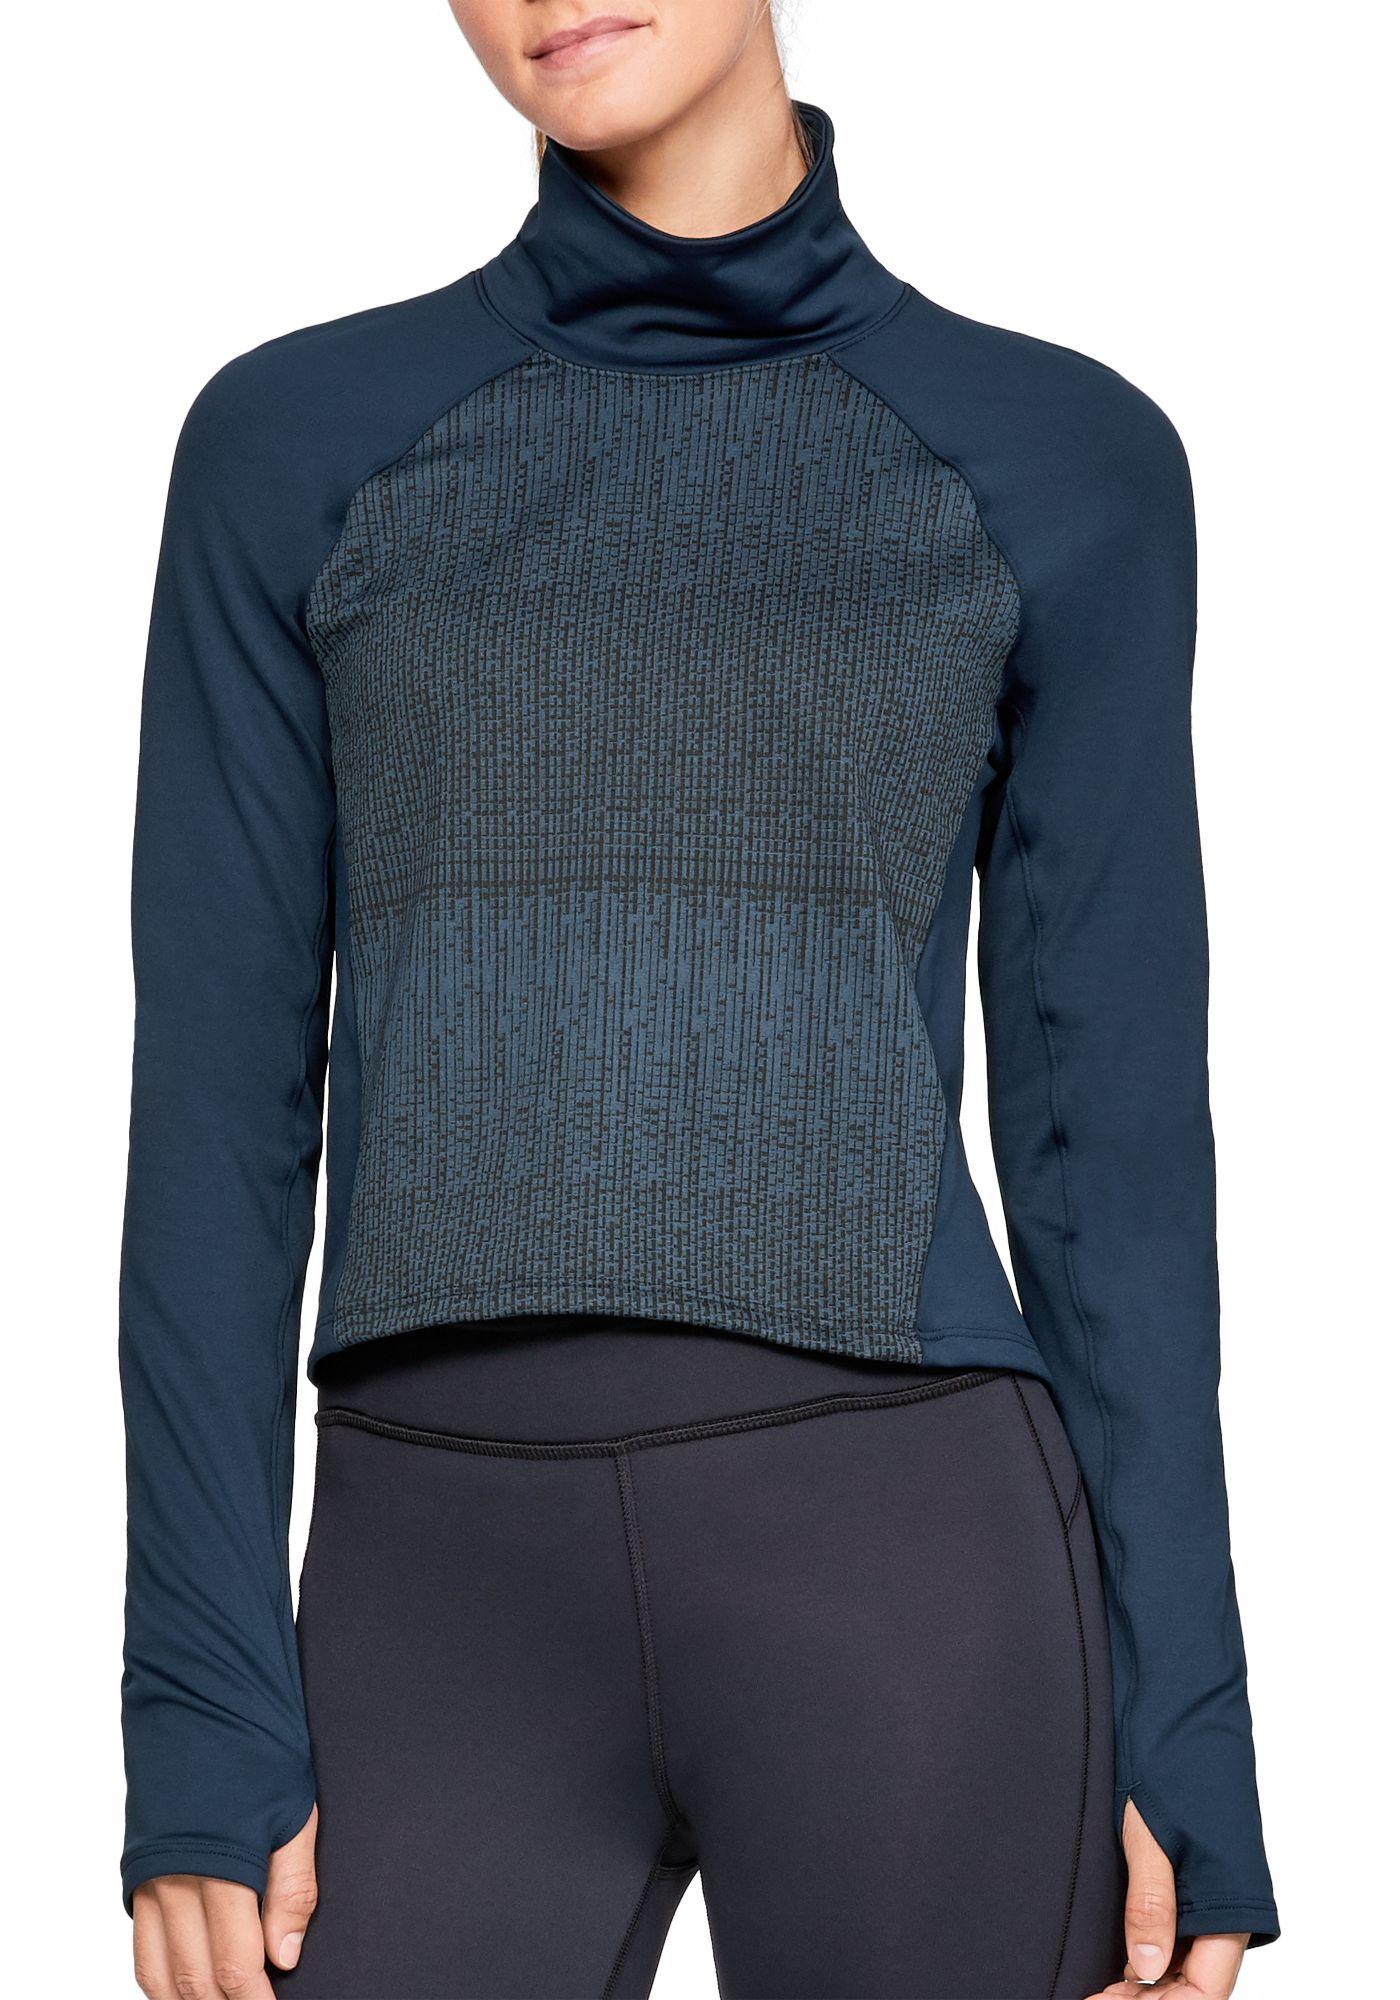 Under Armour Women's ColdGear Cozy Mock Neck Long Sleeve Shirt